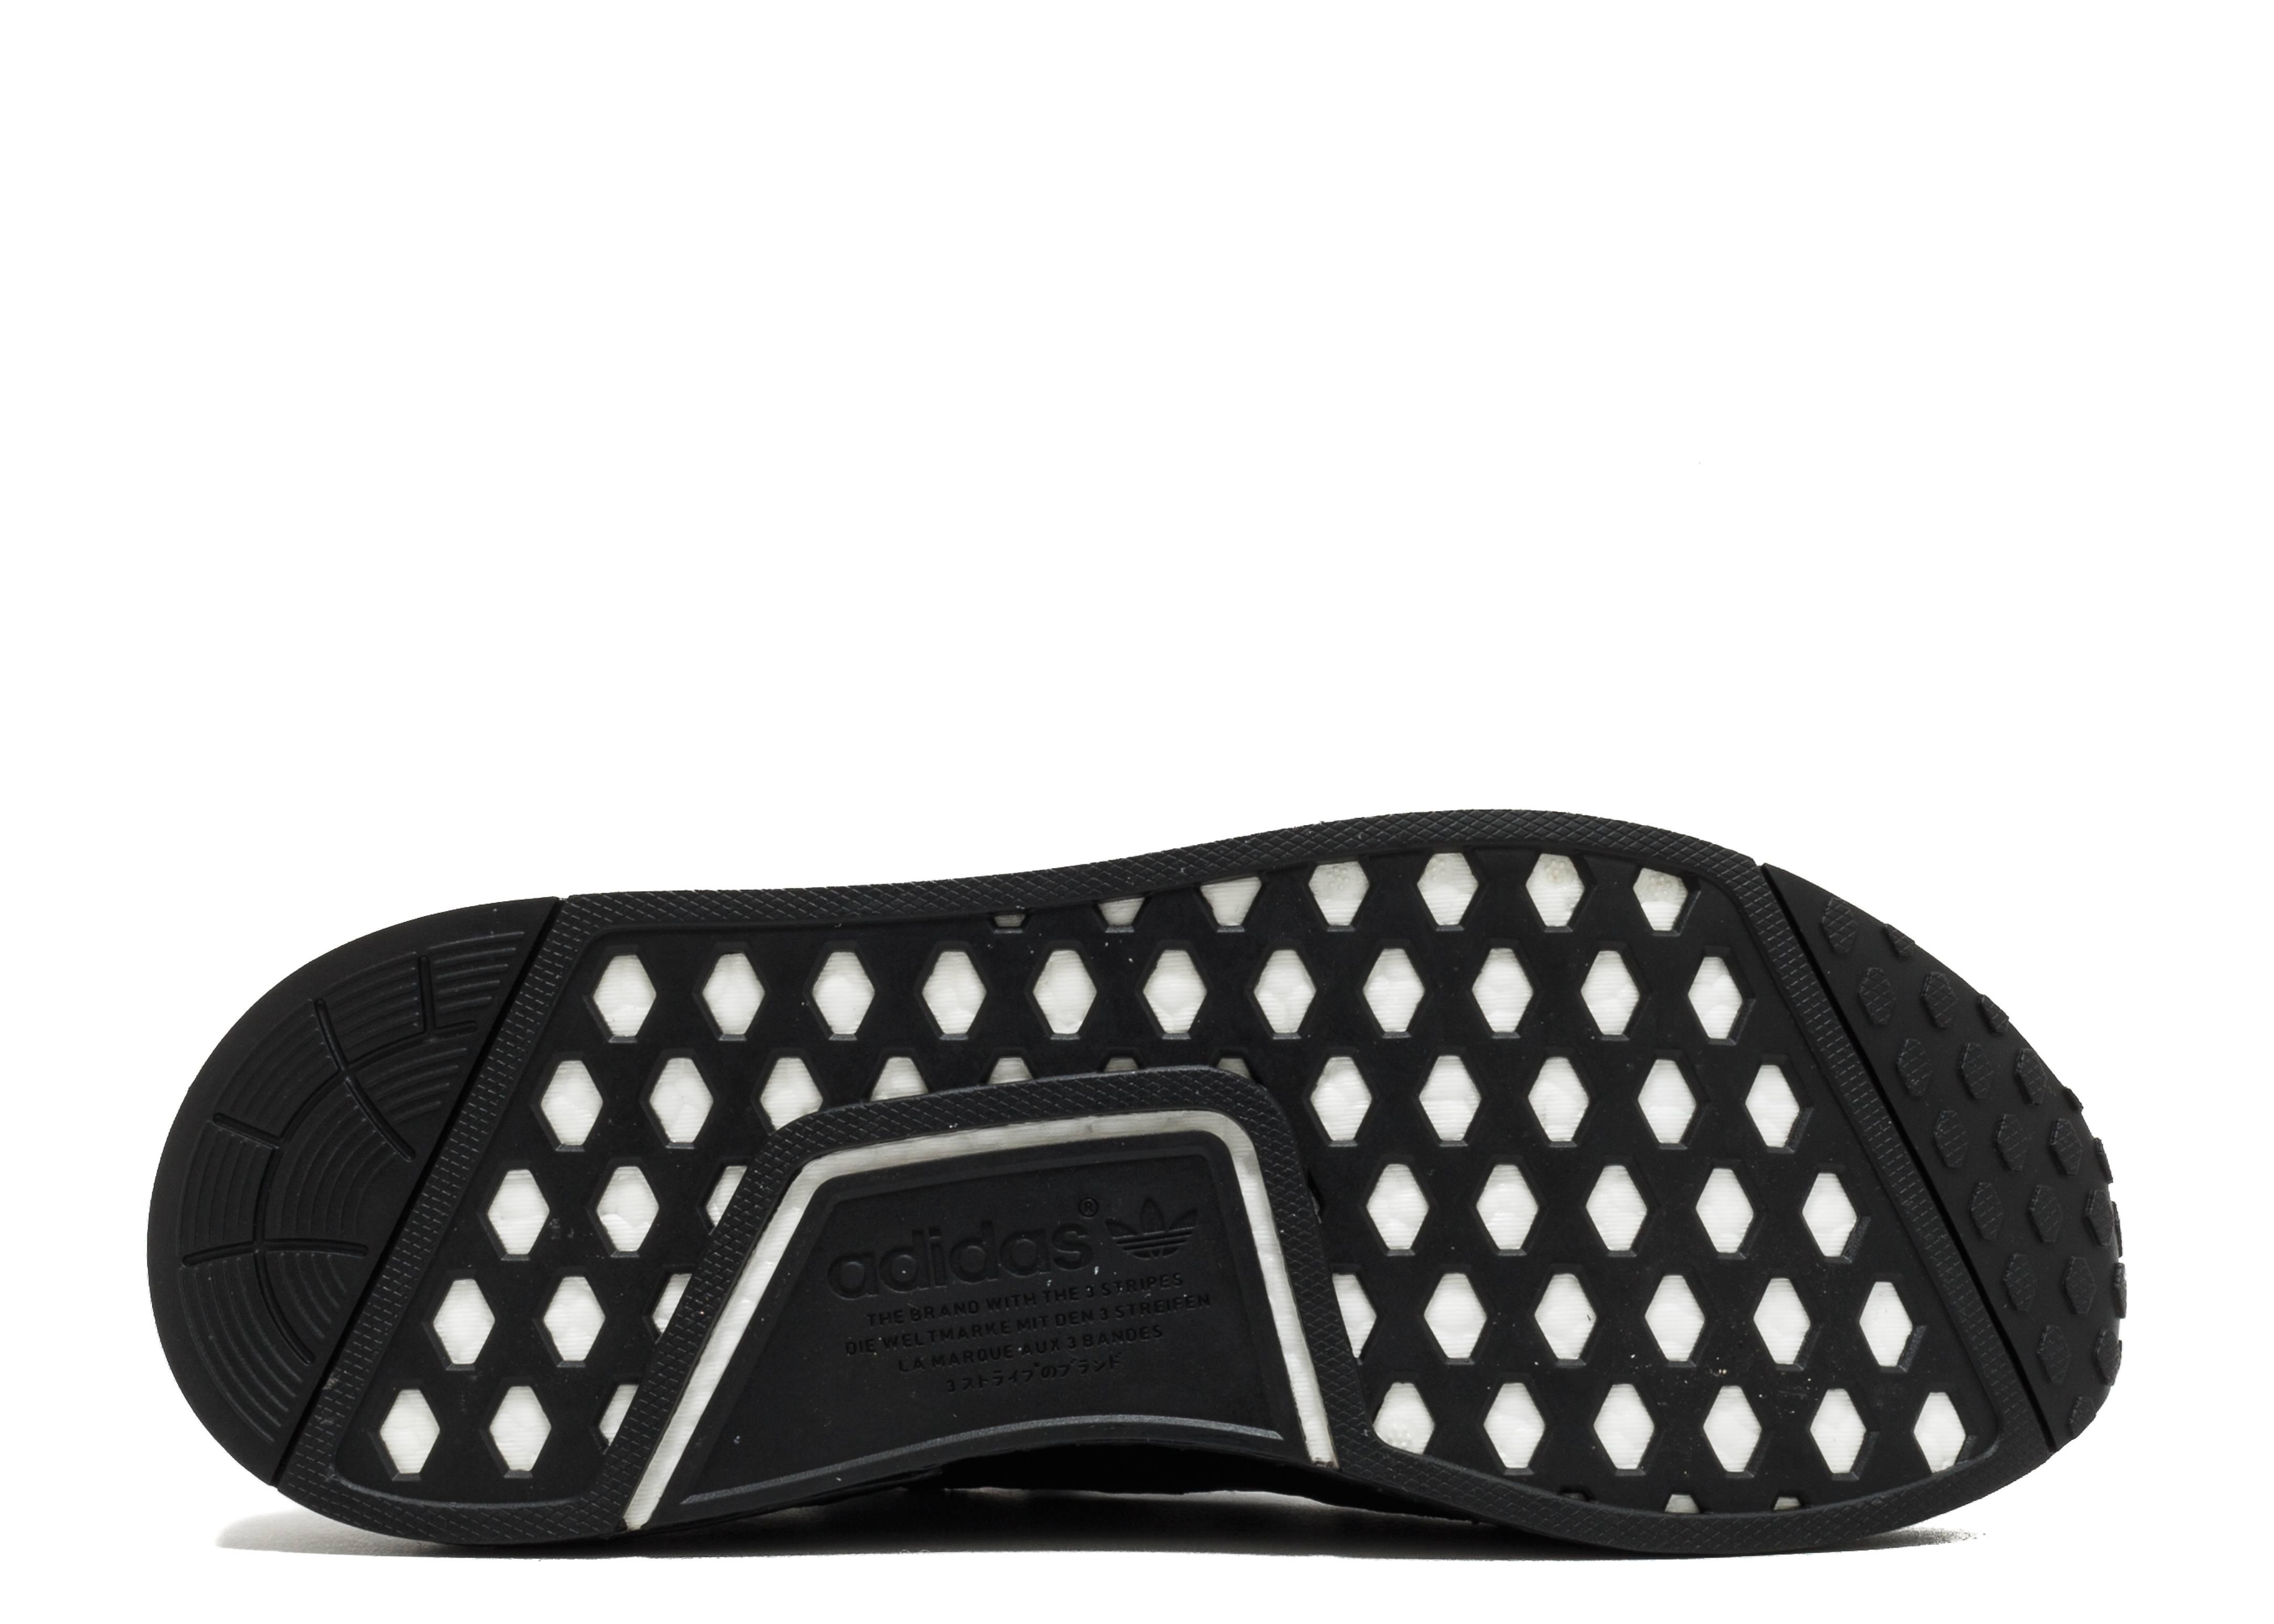 TOP Adidas NMD R1 PK Boost